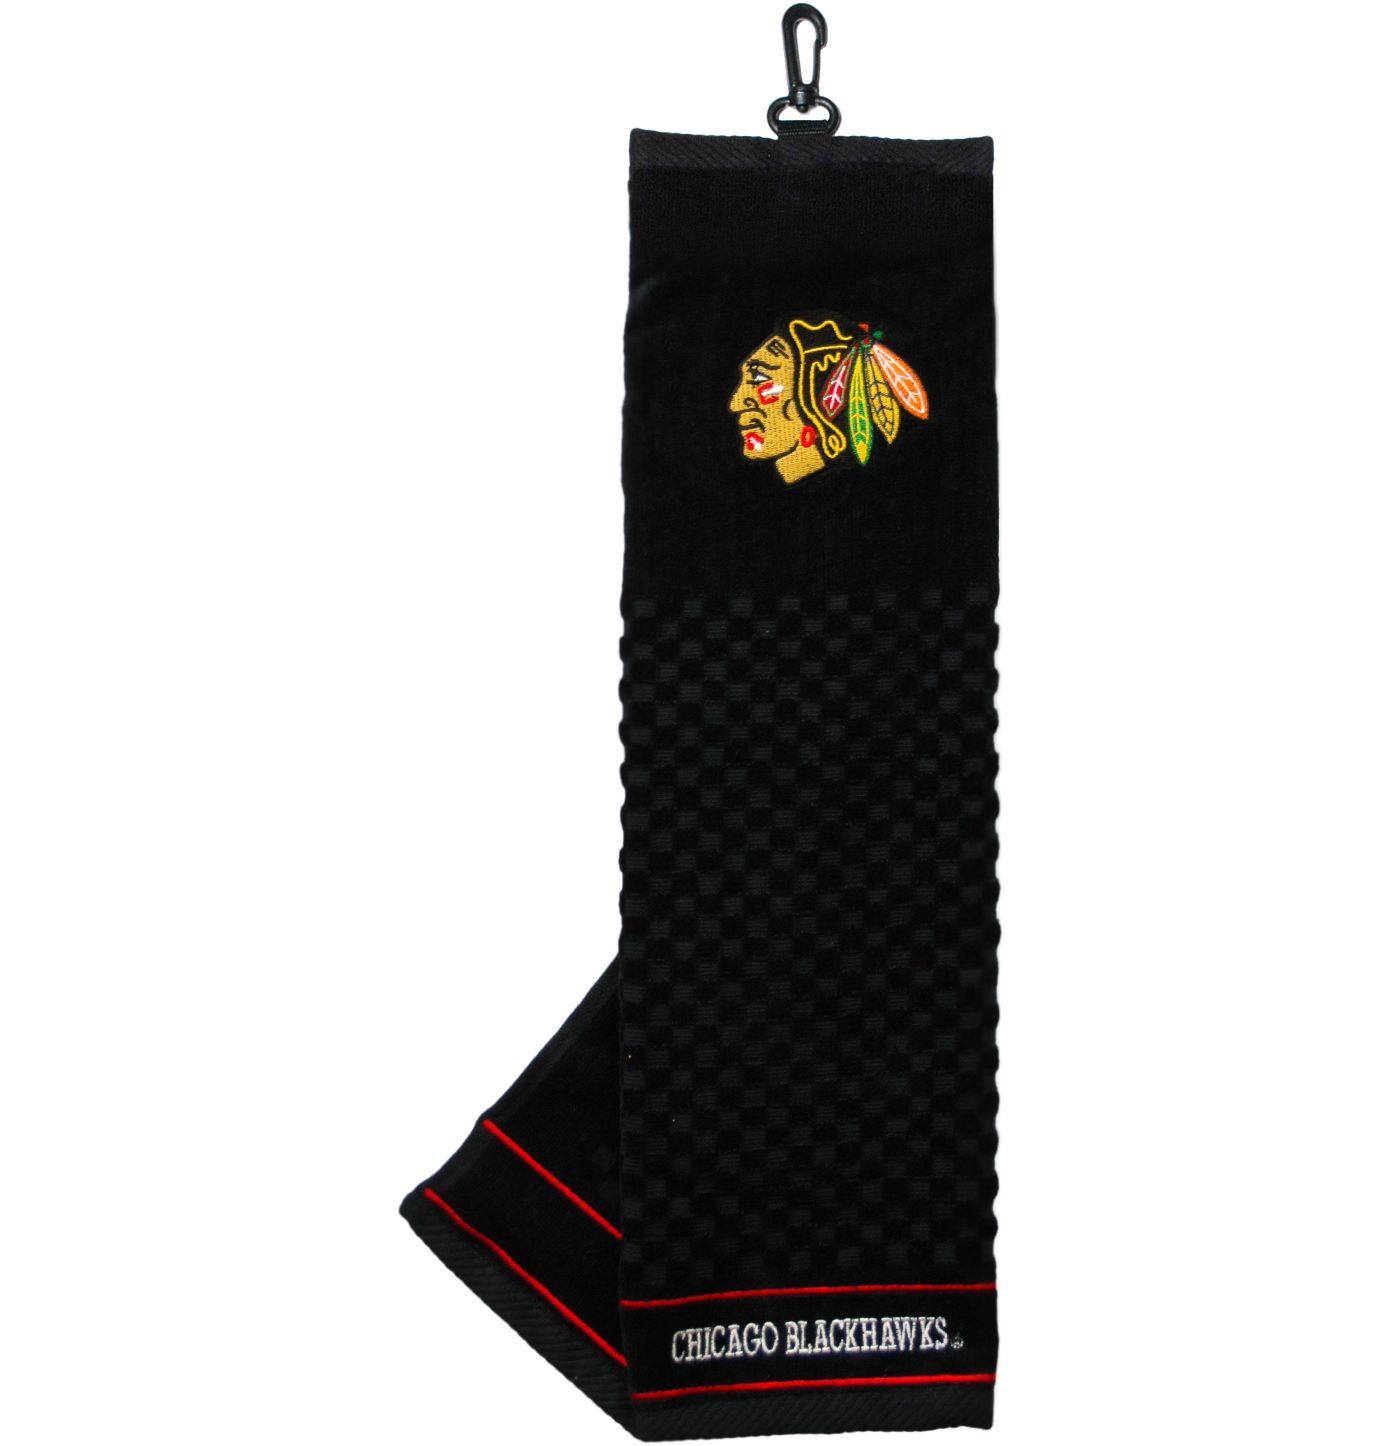 Team Golf Chicago Blackhawks Embroidered Towel